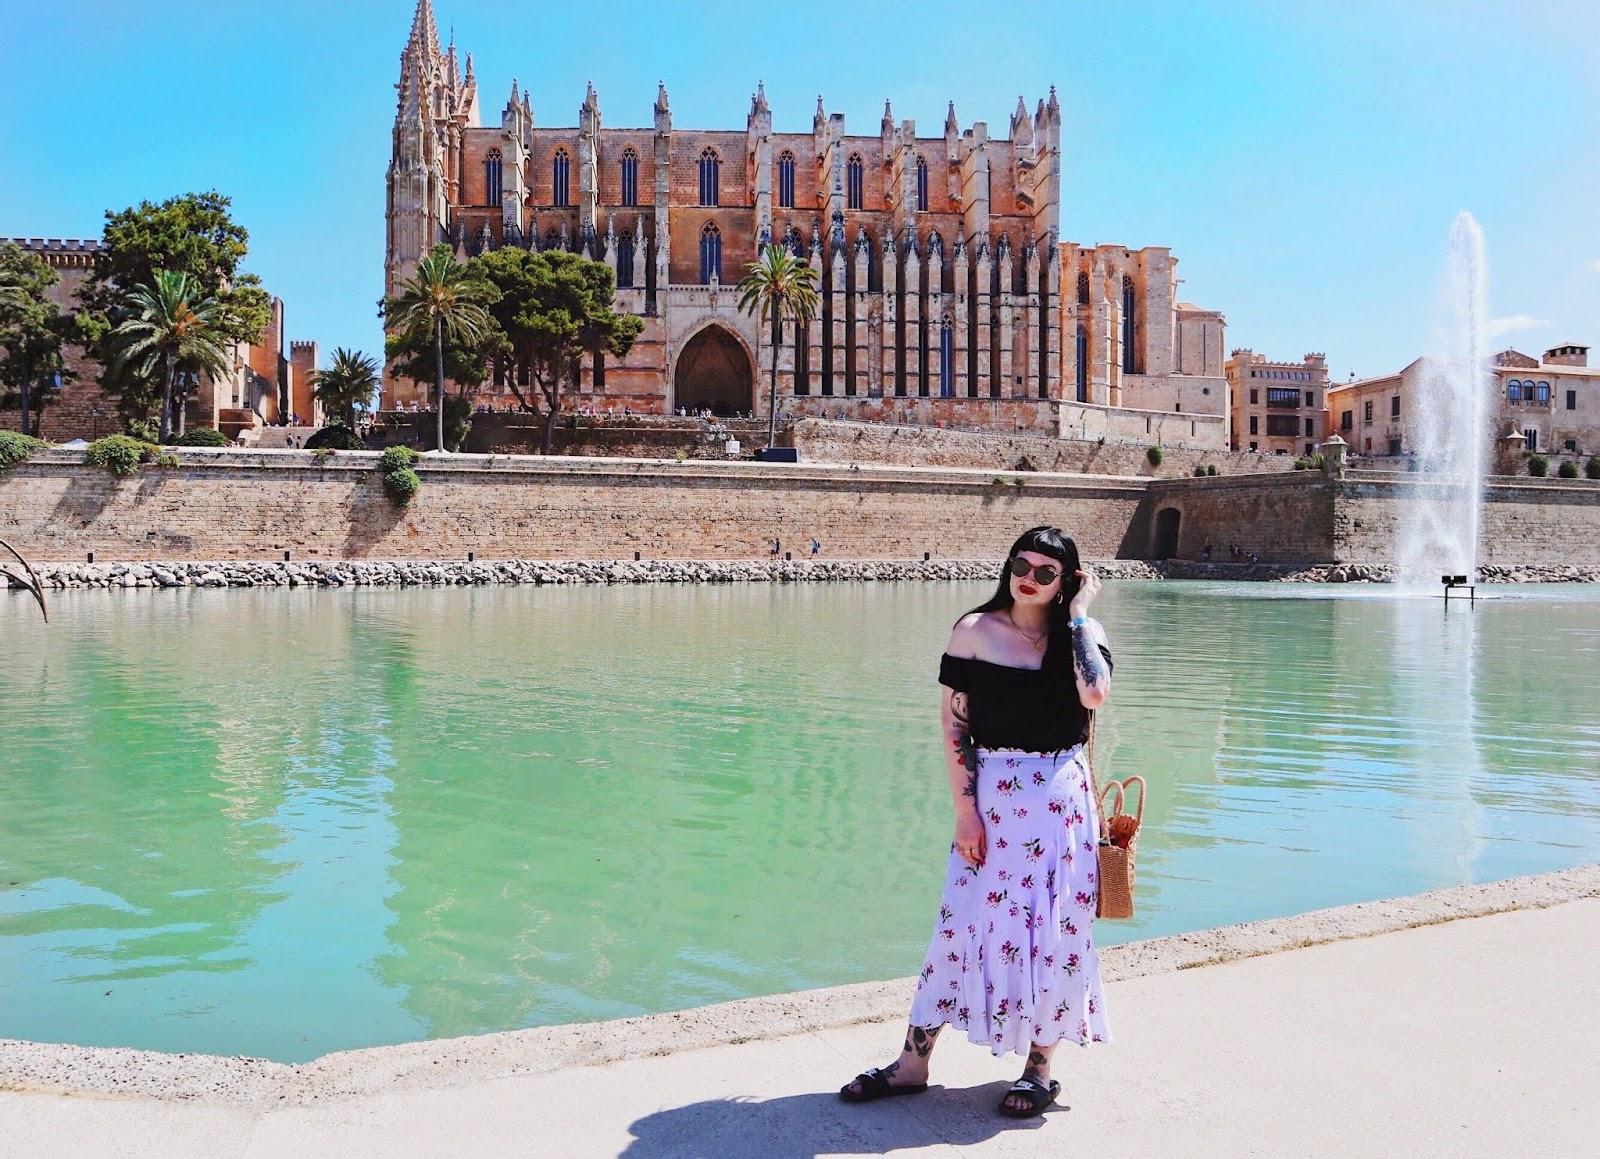 Travel Diary: 5 Things to Do in Palma de Mallorca